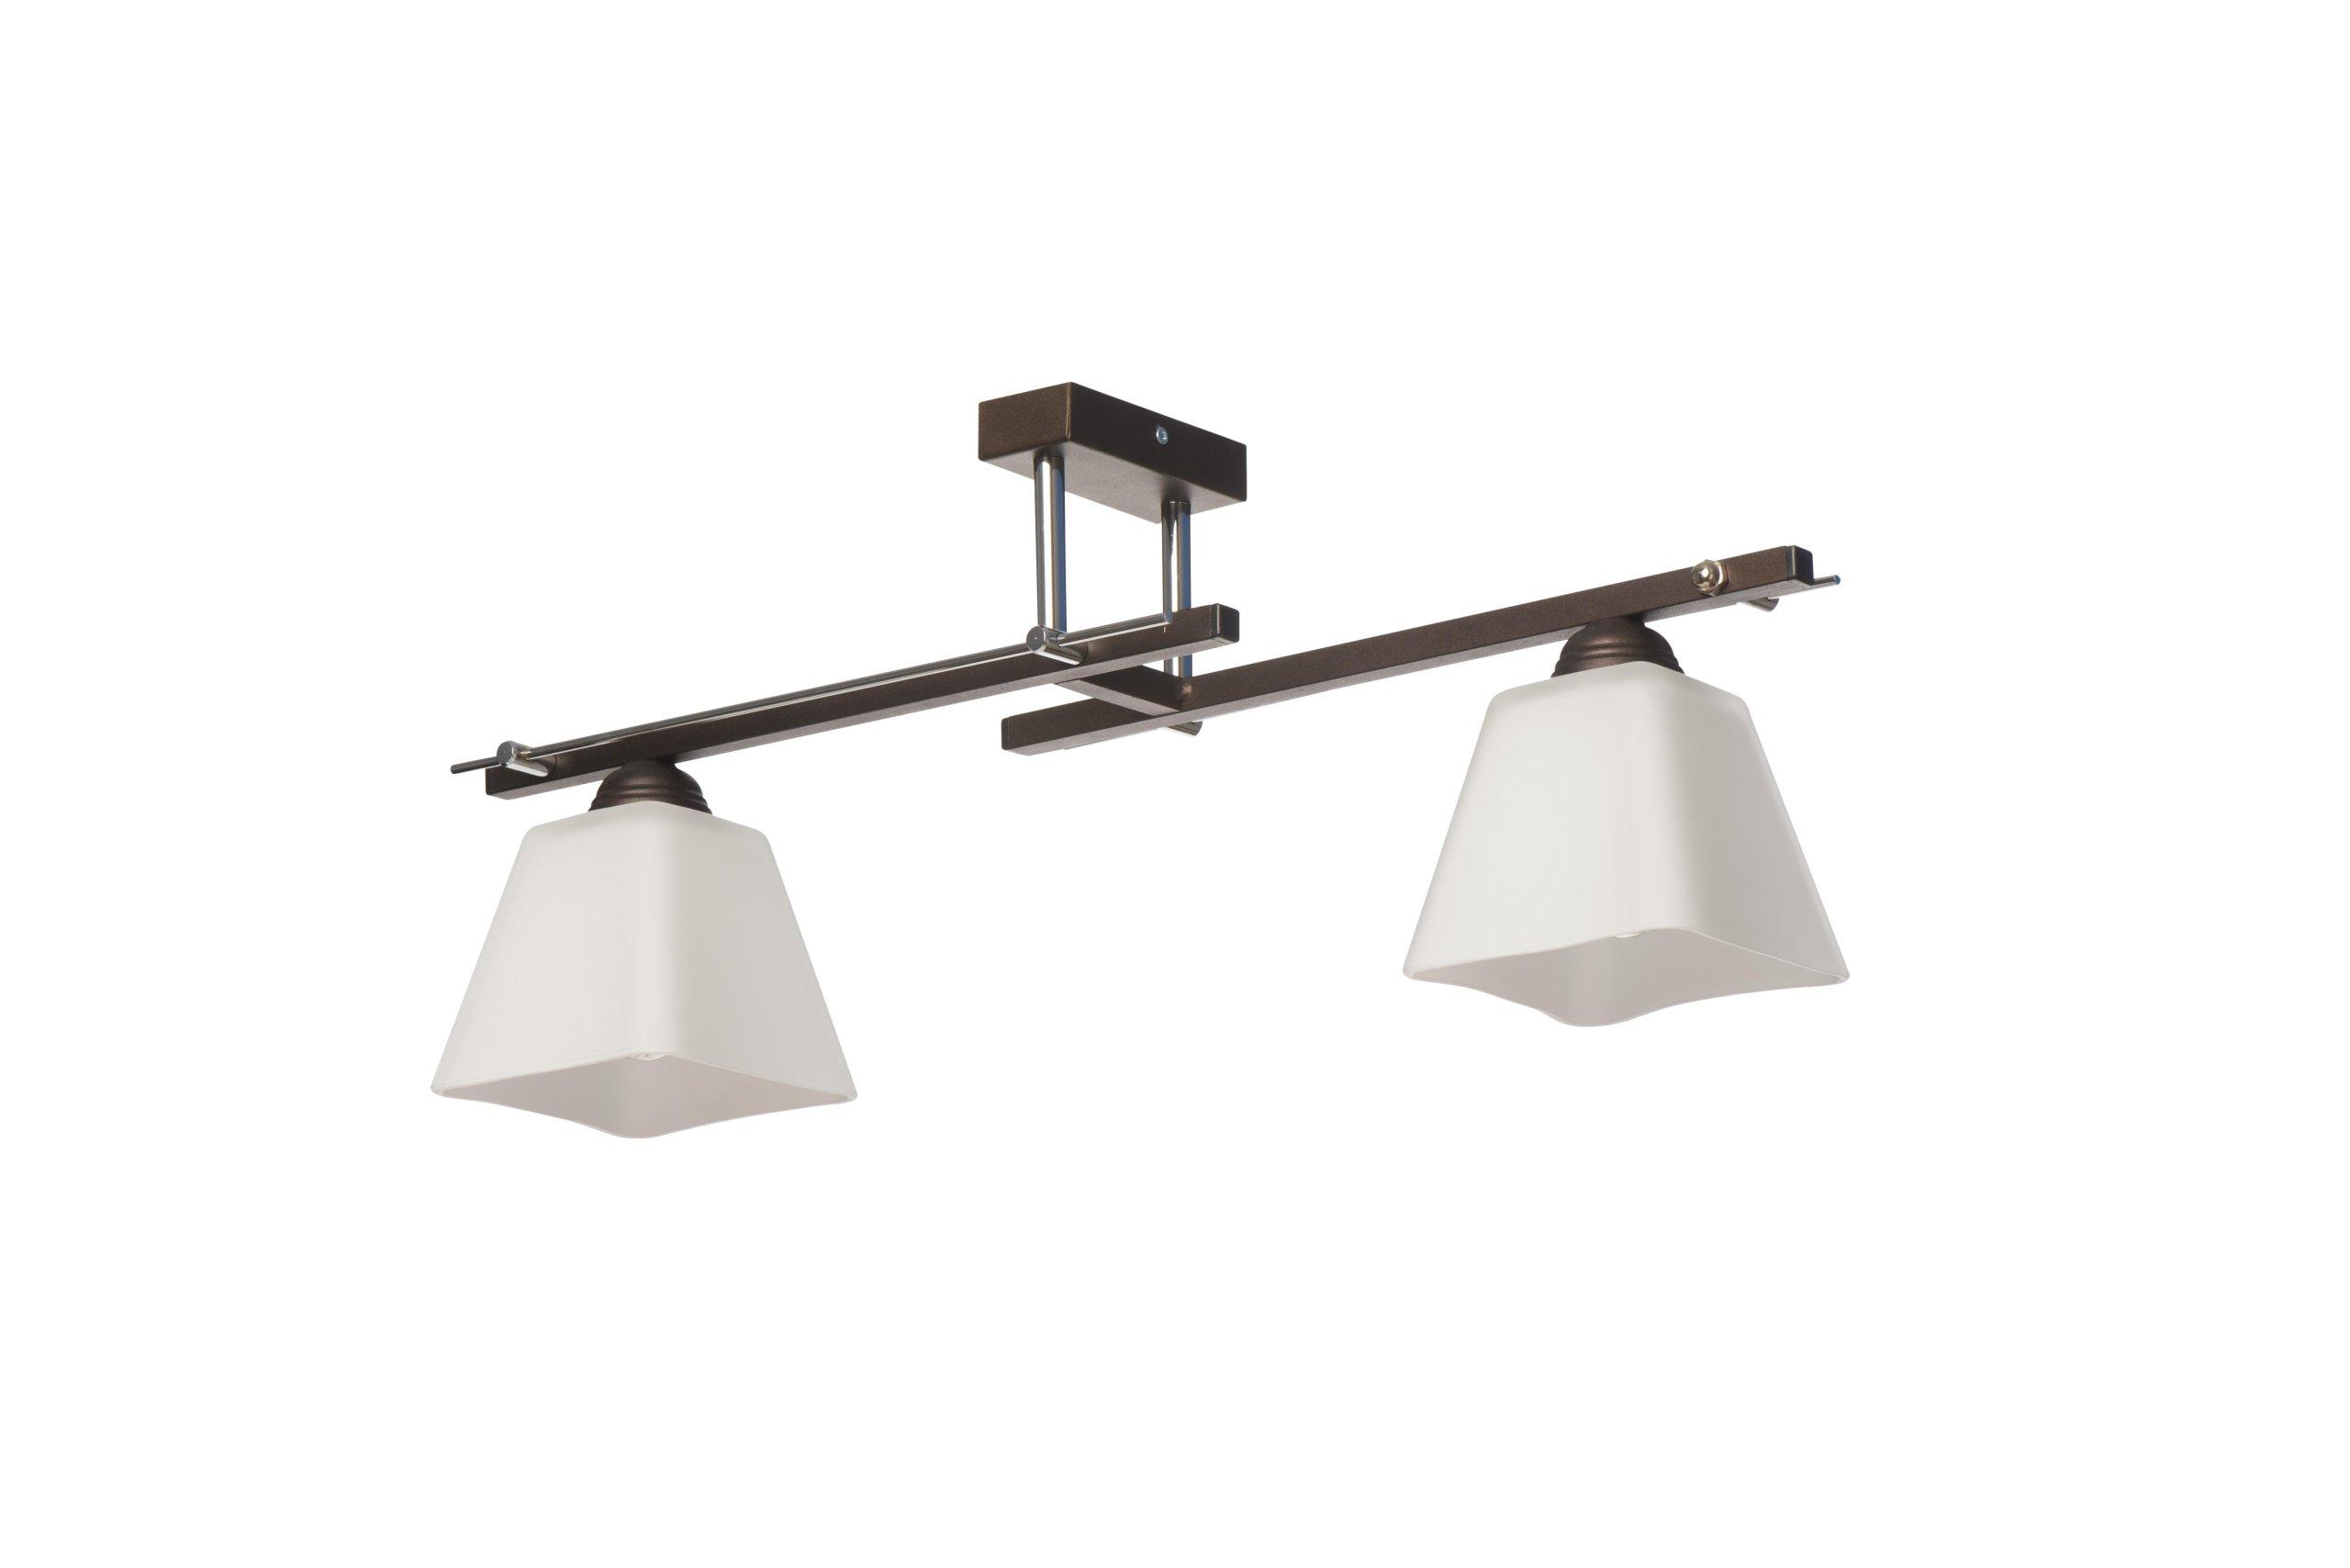 Lampa Sufitowa Eri 2 Listwa Od Producenta Lampex